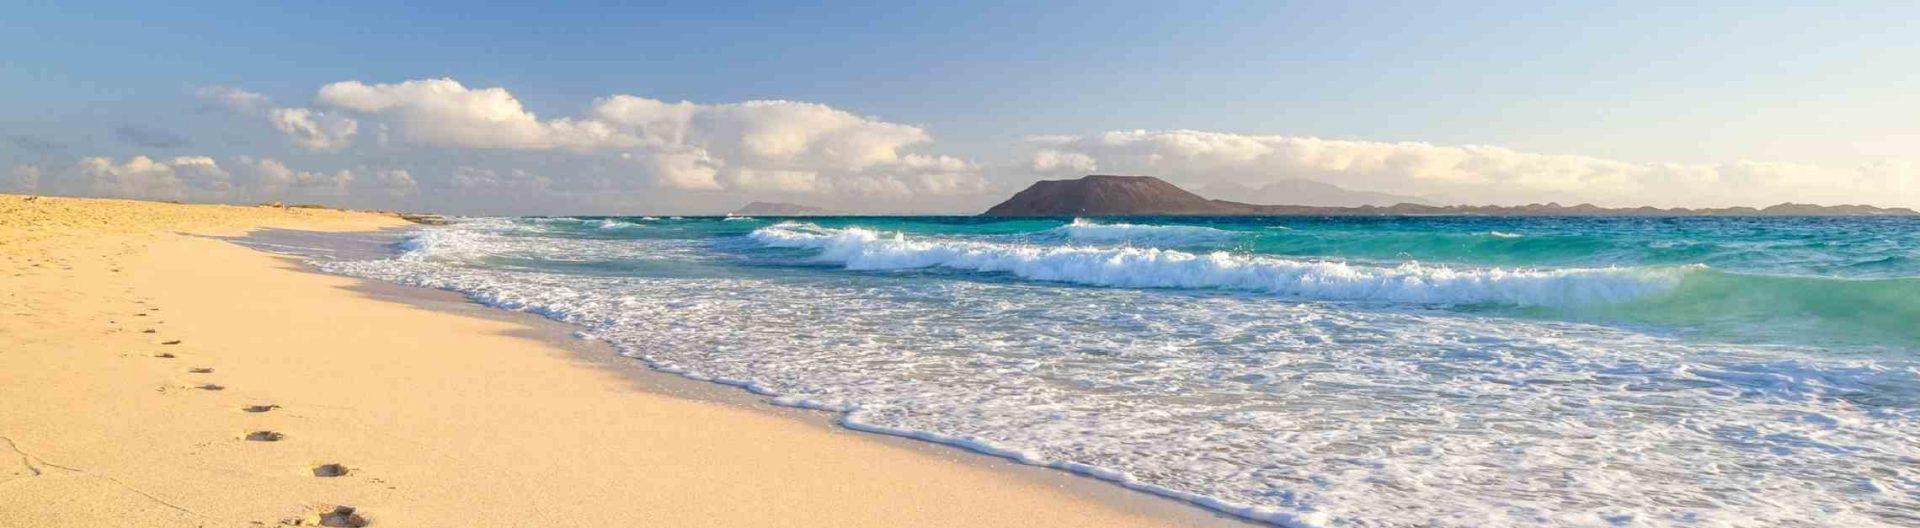 Corallejo-ranta-Fuerteventura-Kanariansaaret-1920x528.jpg